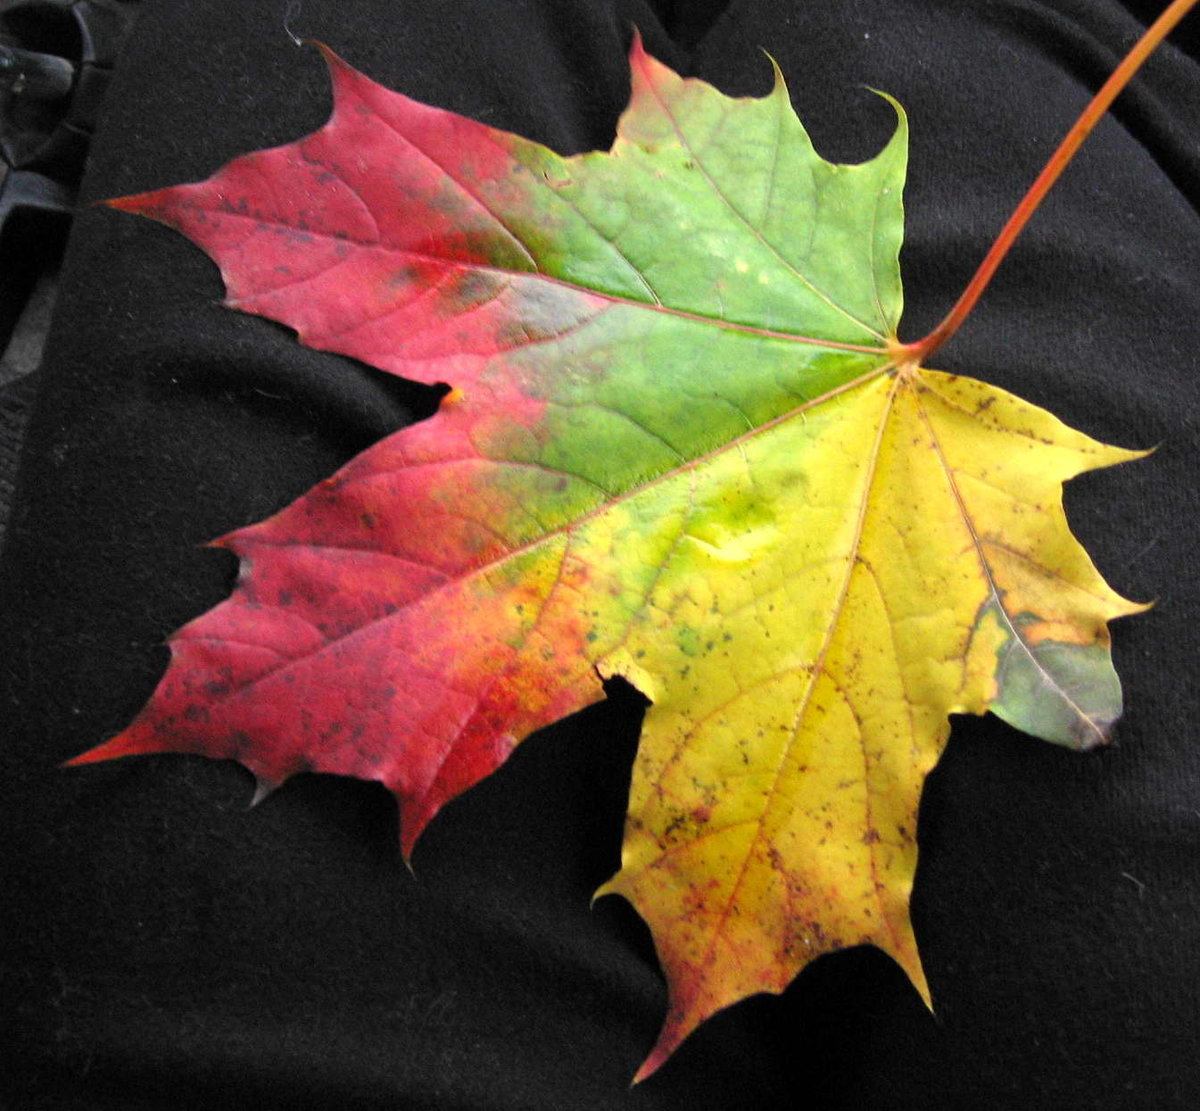 лишним картинка красивого кленового листа берлин один